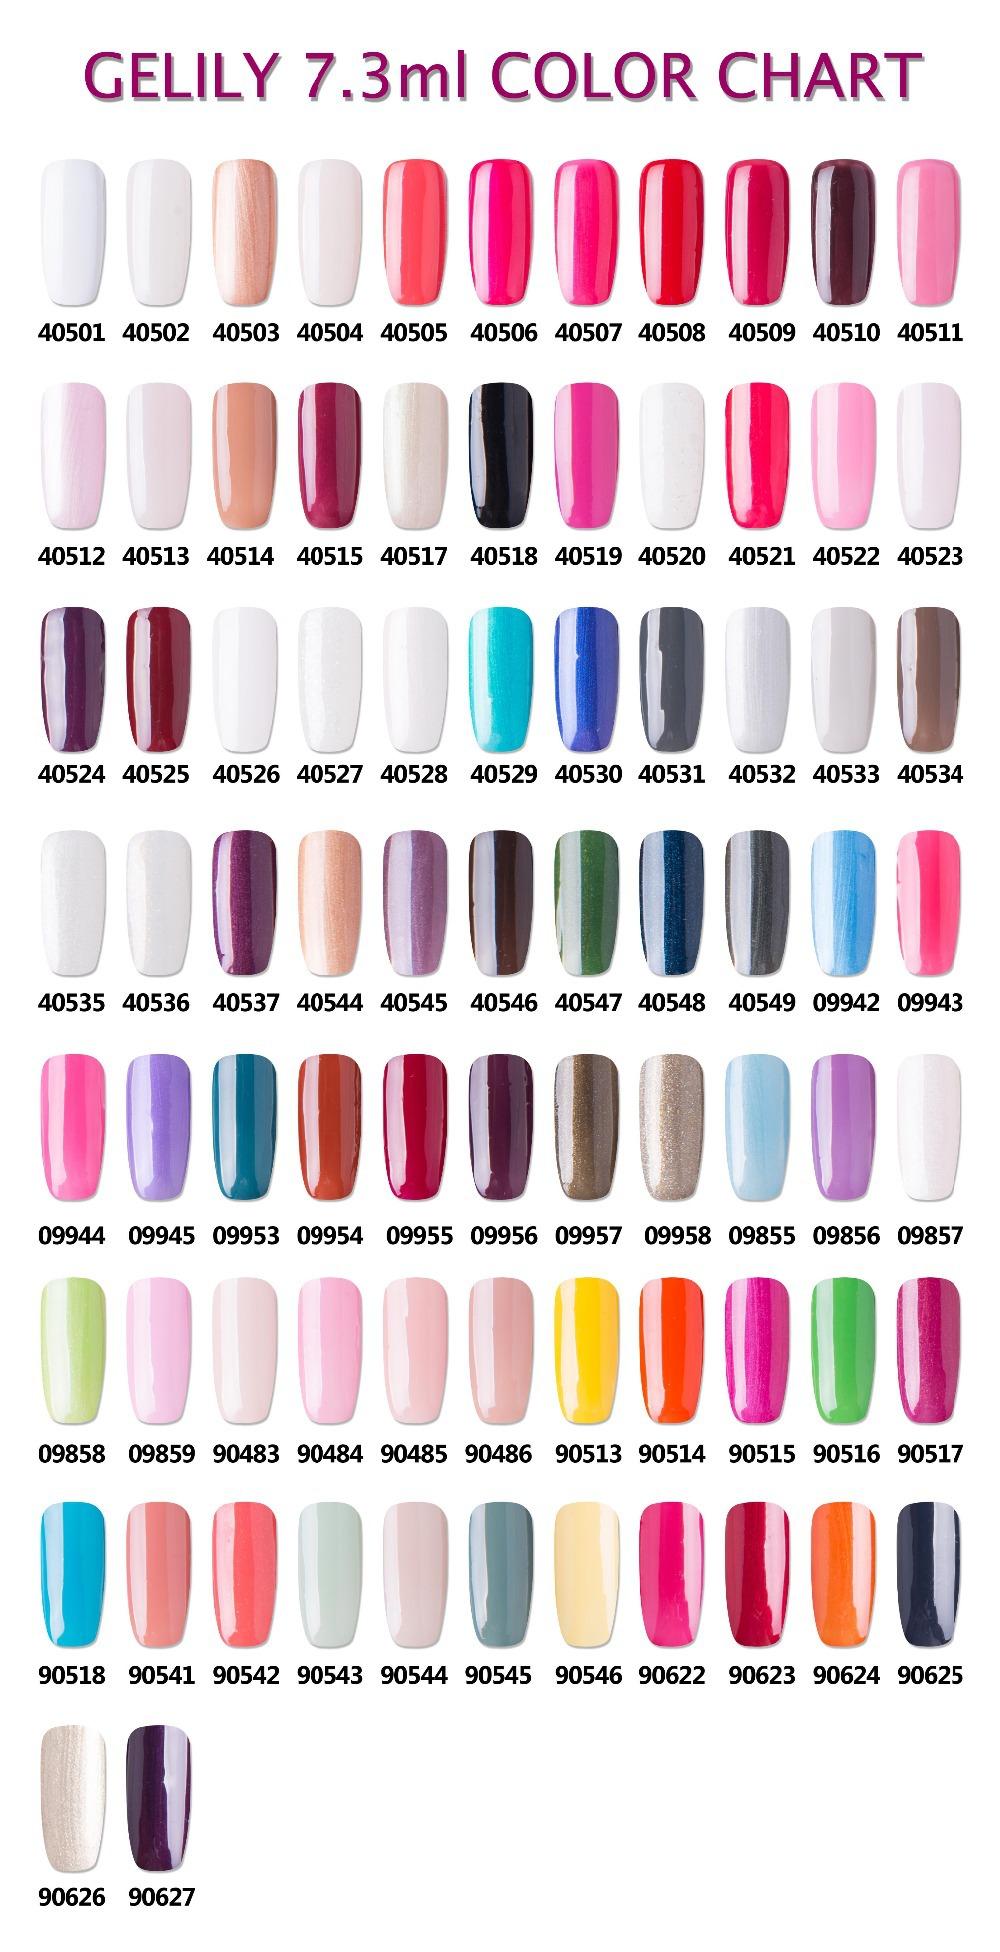 New Brand! Soak Off Velvet Powder Nail Polish 79 Colors 7.3ml - Buy ...